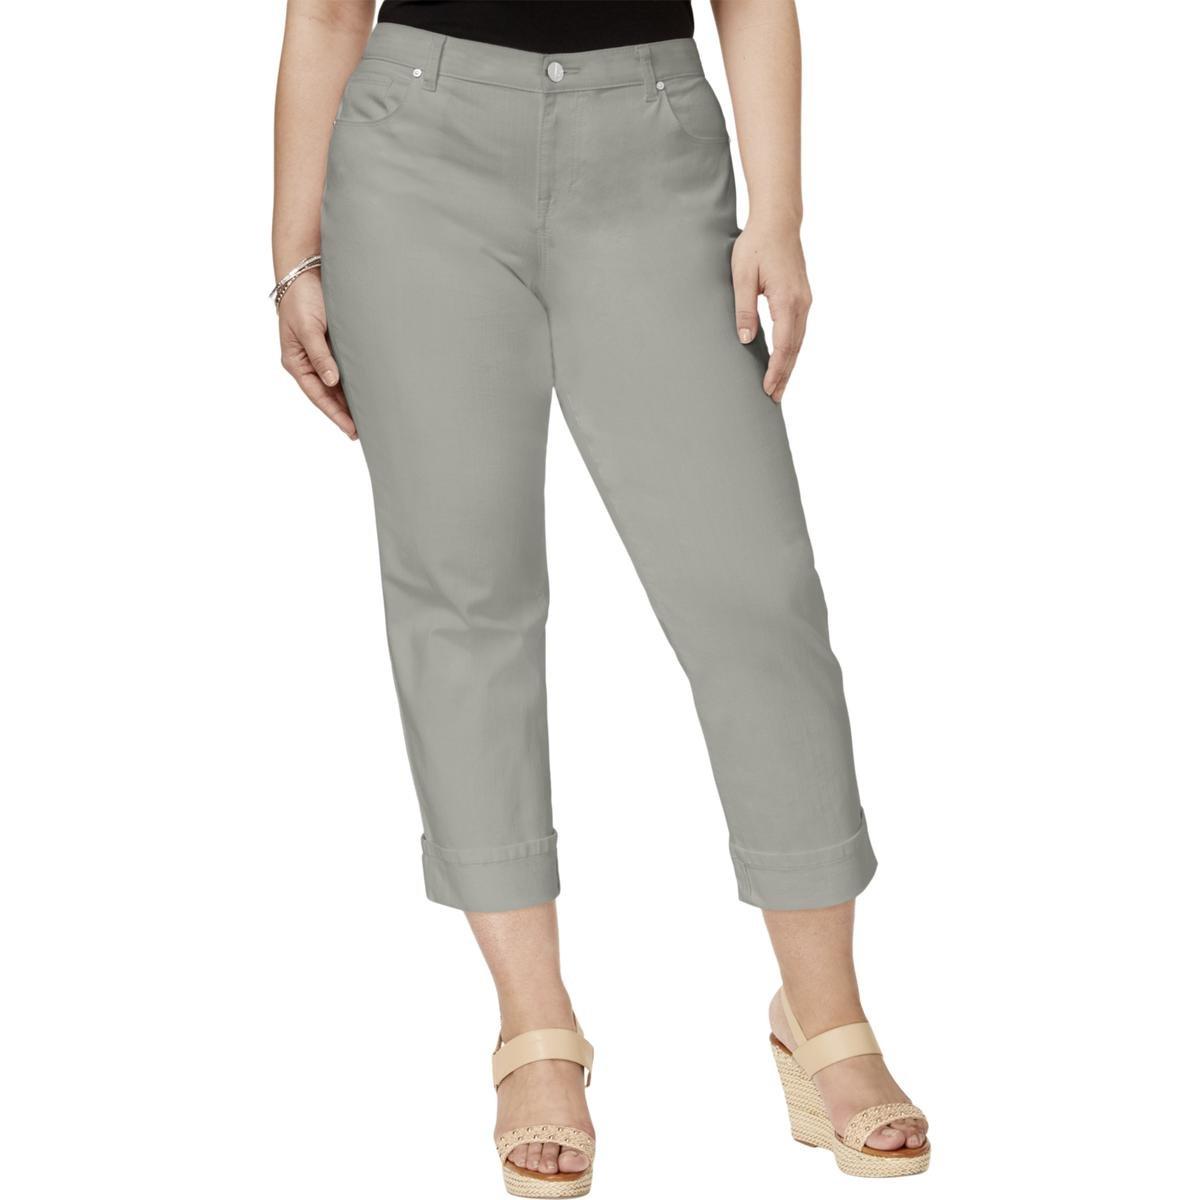 Style & Co. Womens Plus Twill Cuffed Capri Pants Gray 24W